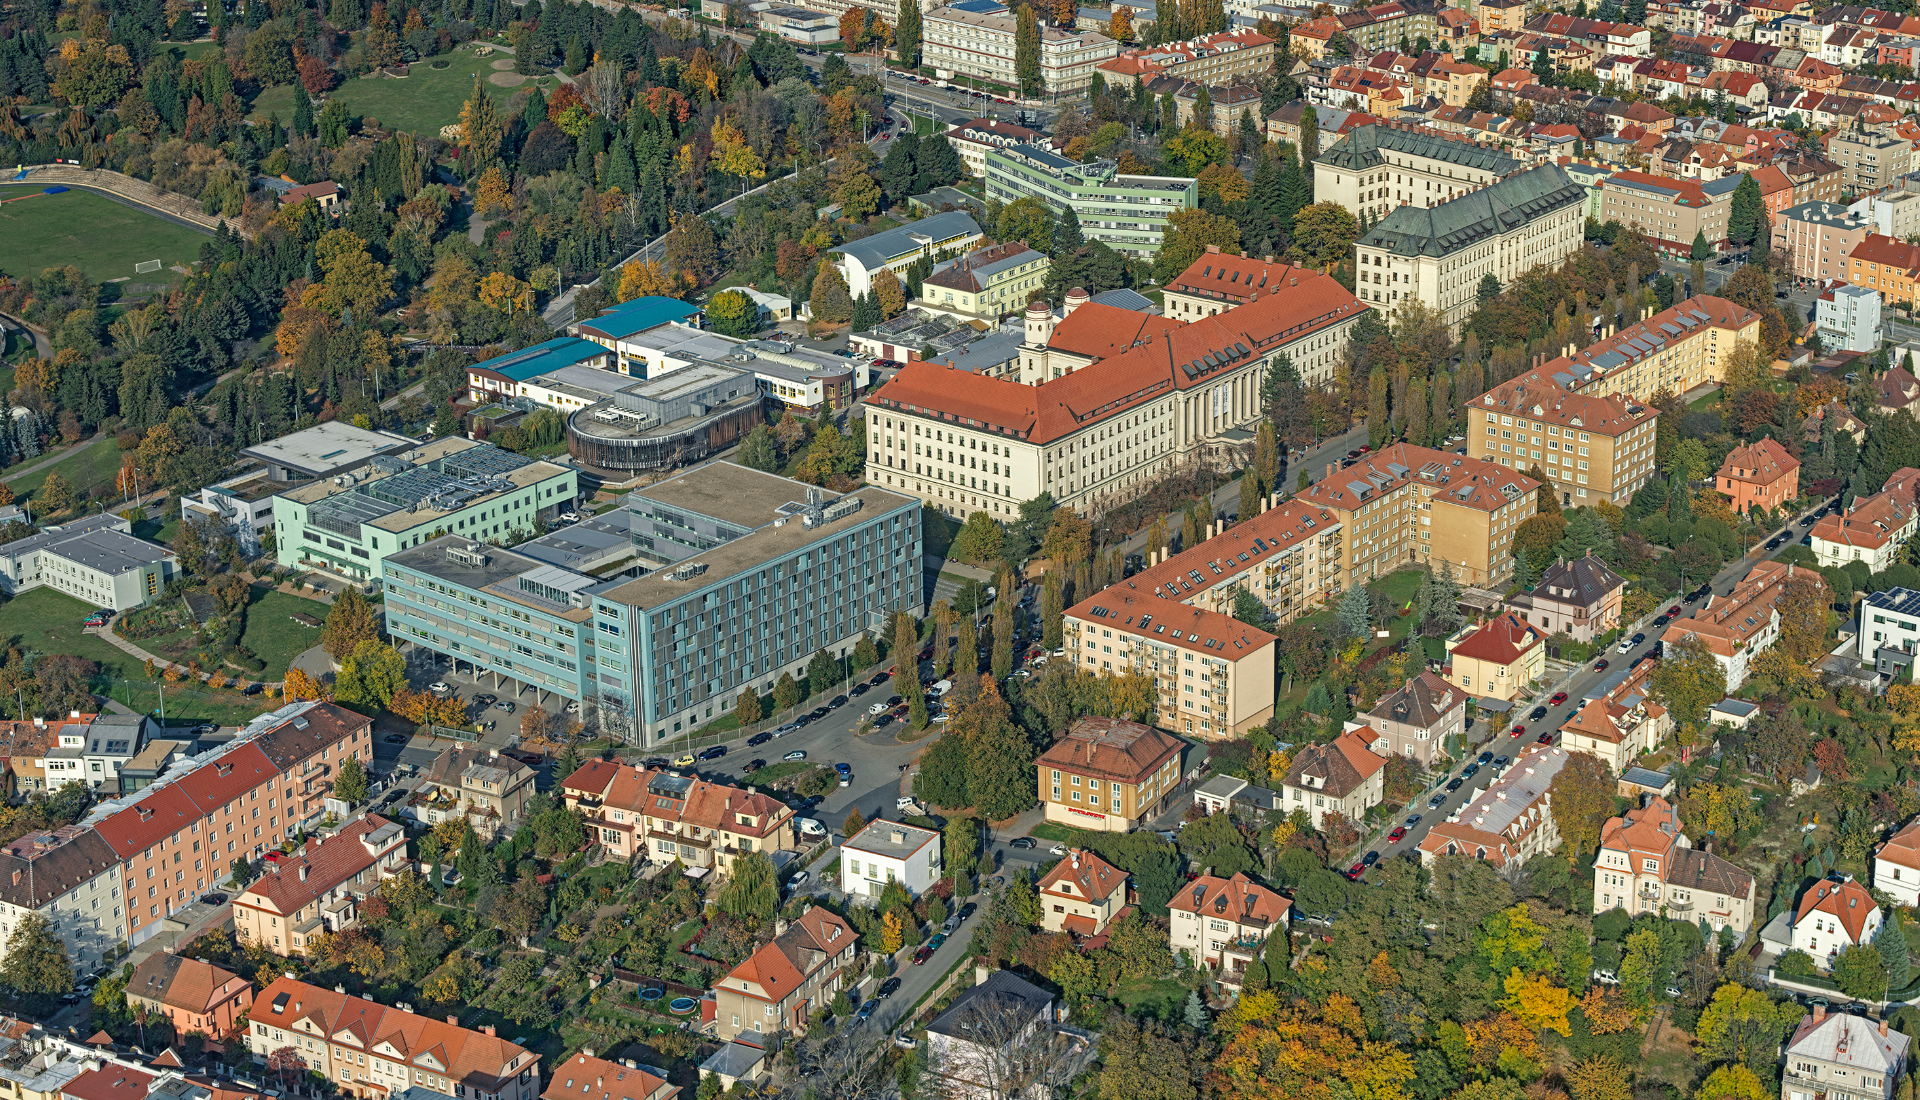 Mendelova univerzita Brno - Letova fotografie - Miroslav Kamrla - 2- 1920x1110_3